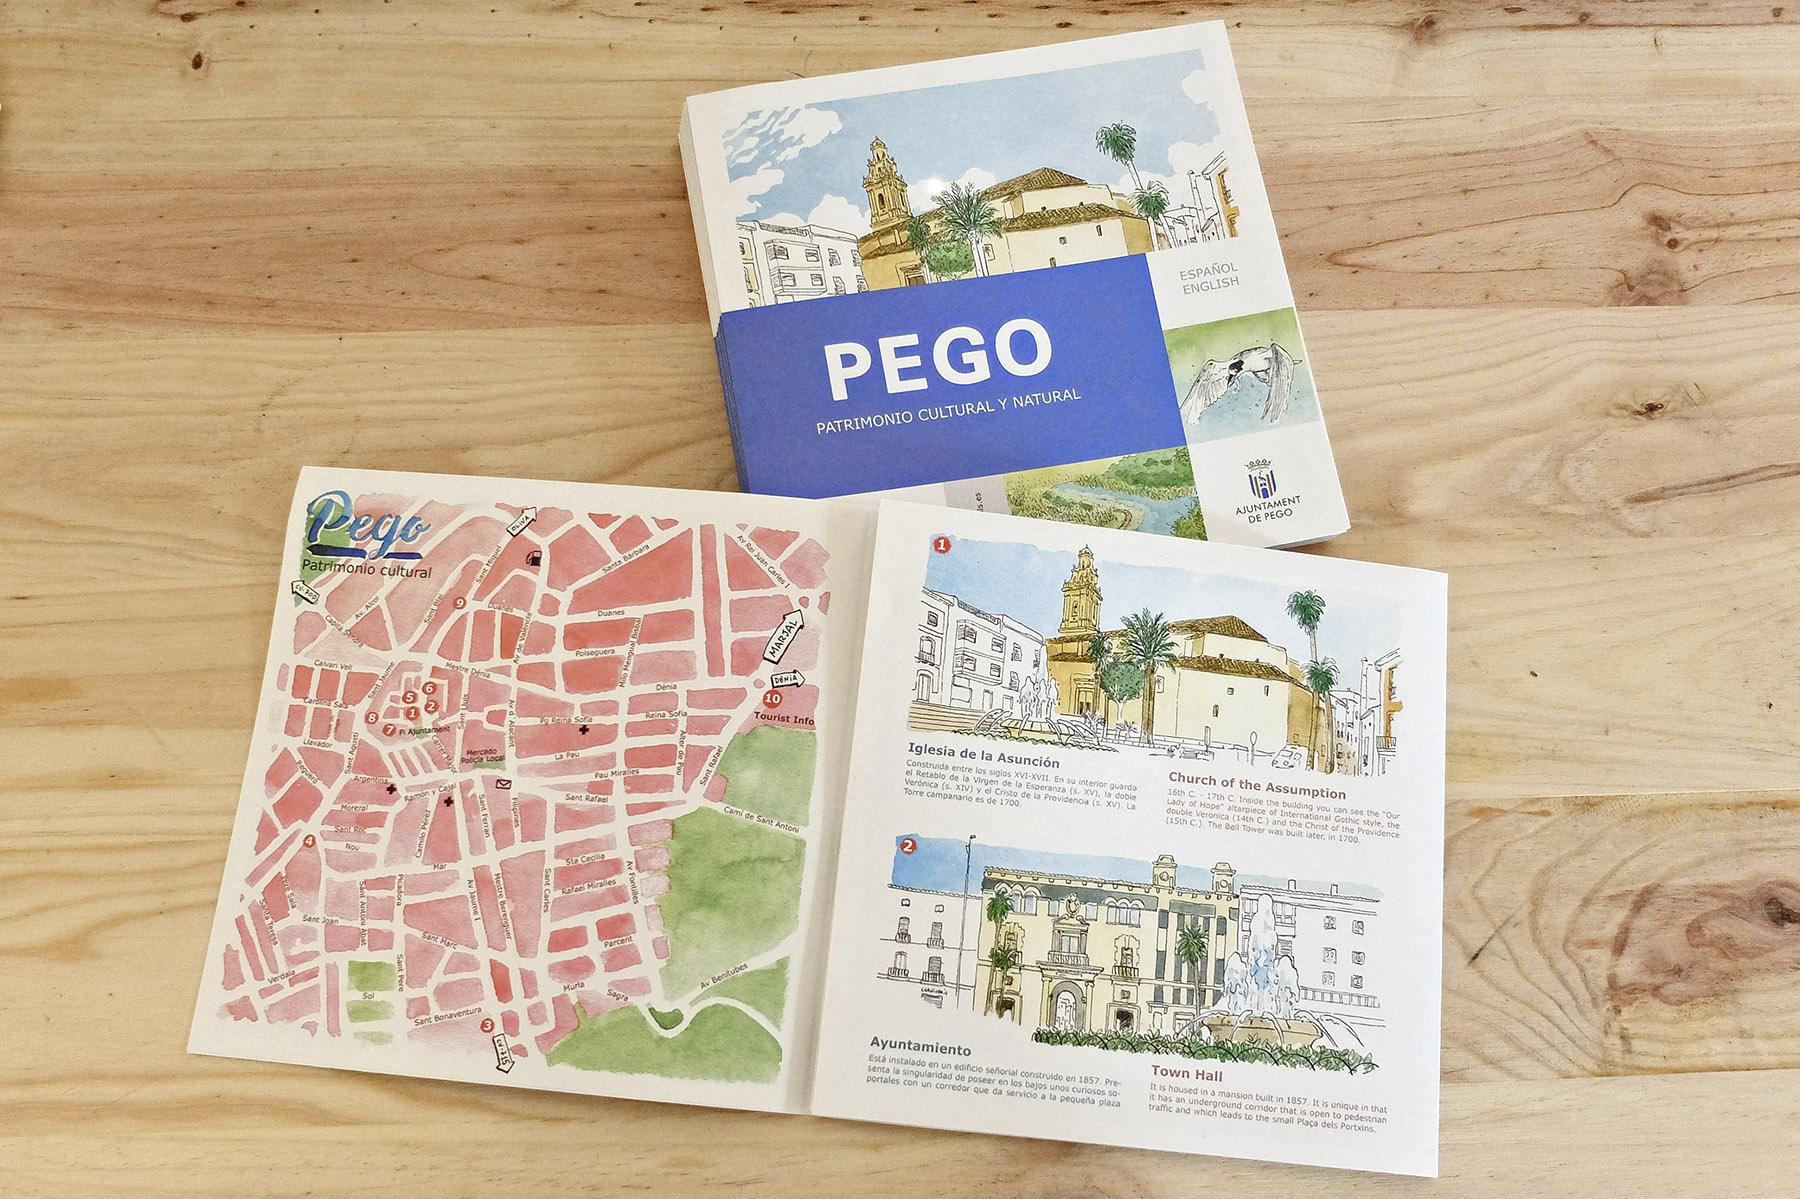 Diseño de mapa de la Marjal Oliva-Pego